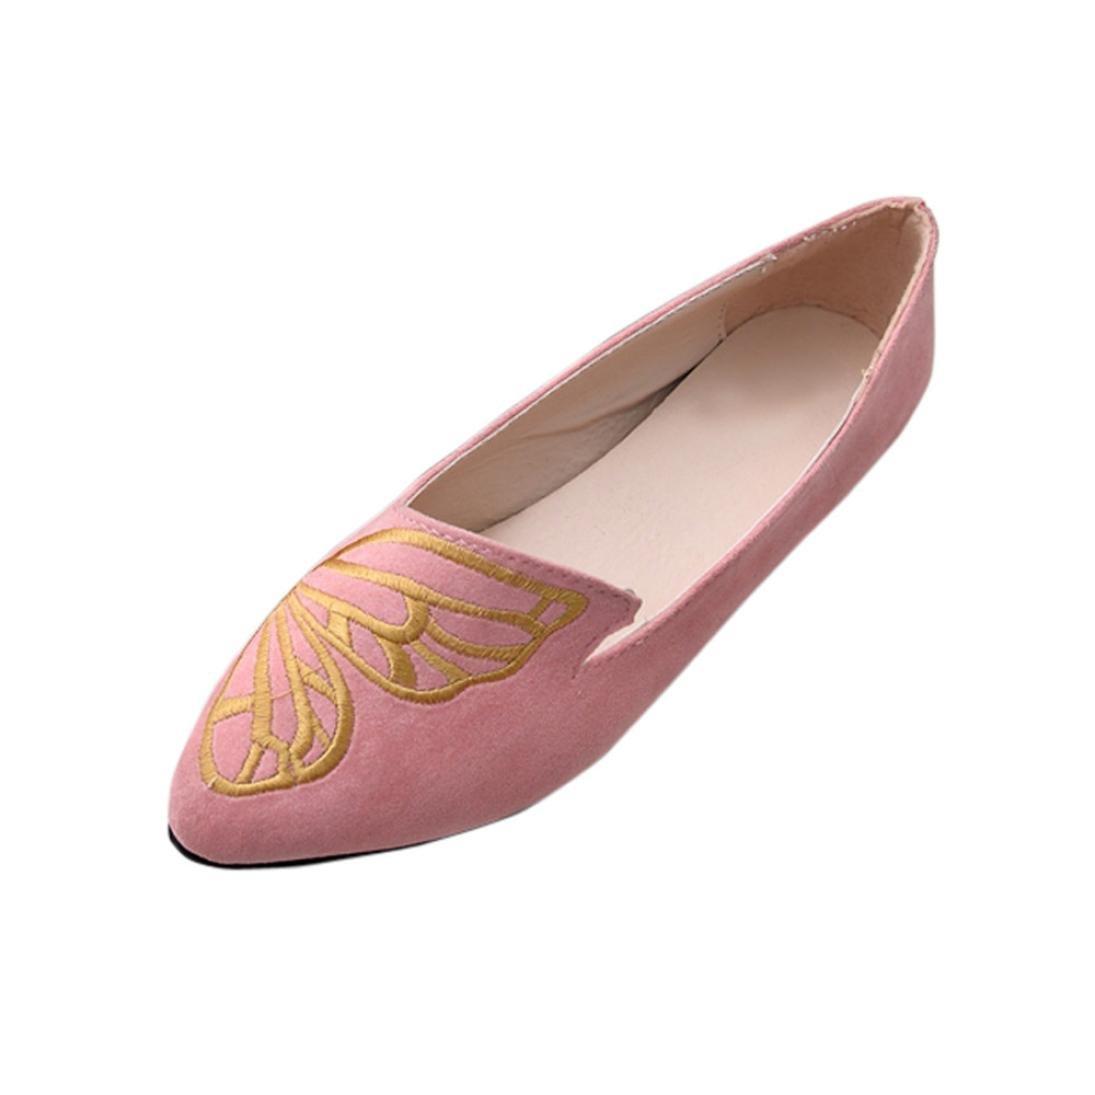 OHQ Mme Broderie Mme Papillon Broderie Daim Pointus Plates Chaussures de Sport Pointus Chaussures Rose Noir Femmes Flats Dames Broderie Papillon Daim Chaussures Doux Slip-On Casual Shoes Rose ceaaada - robotanarchy.space